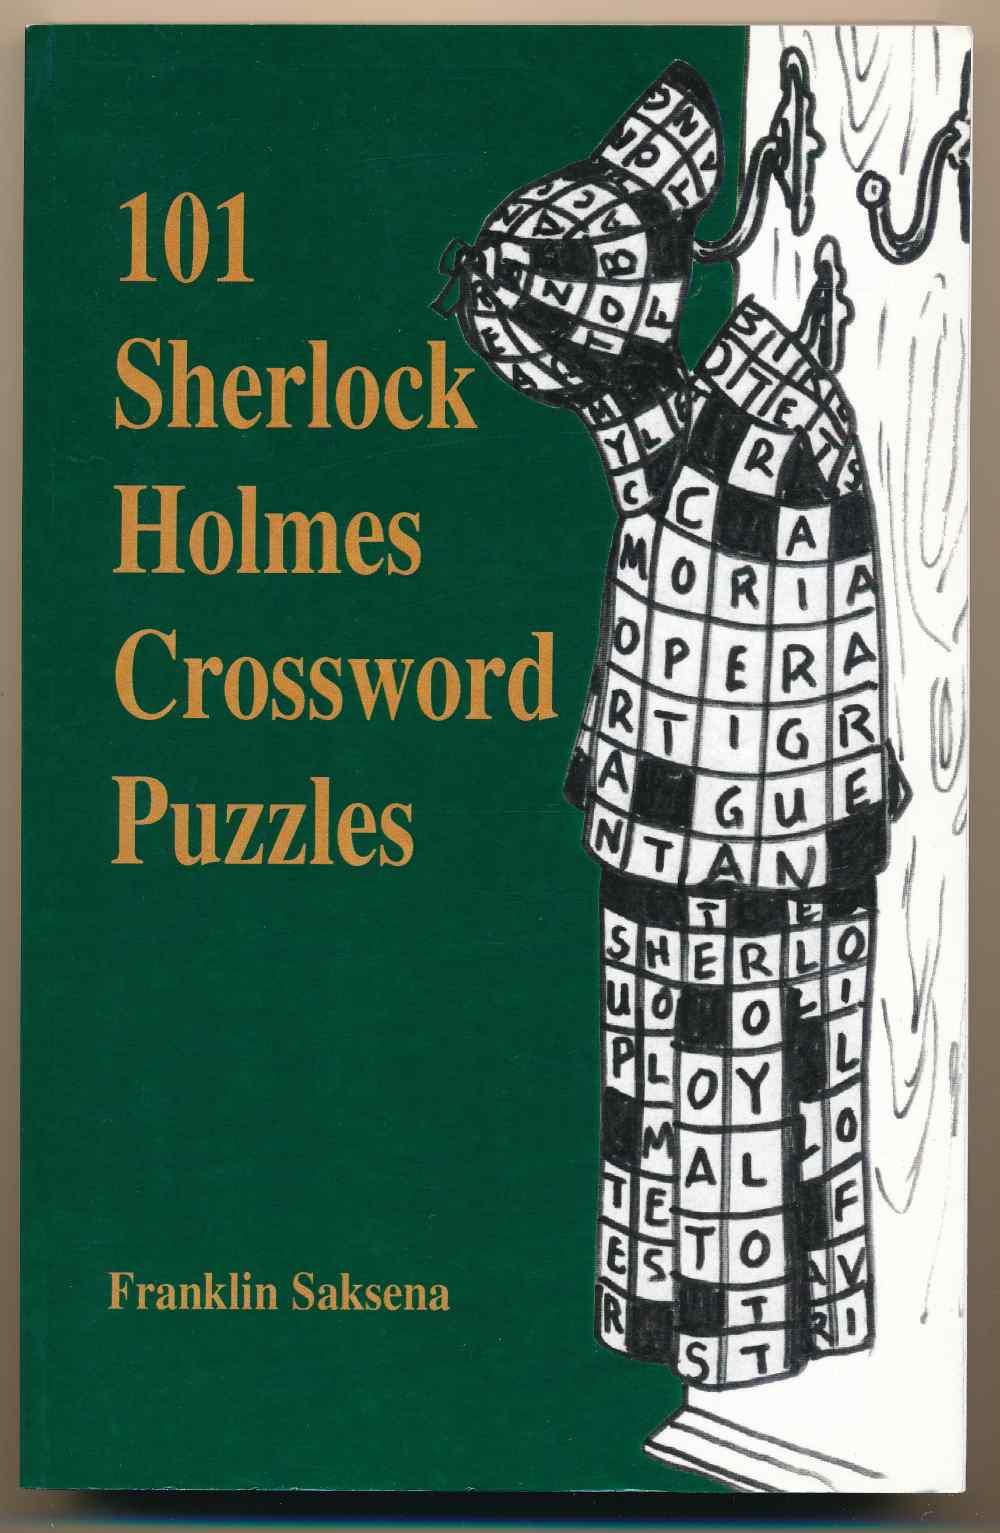 101 Sherlock Holmes crossword puzzles